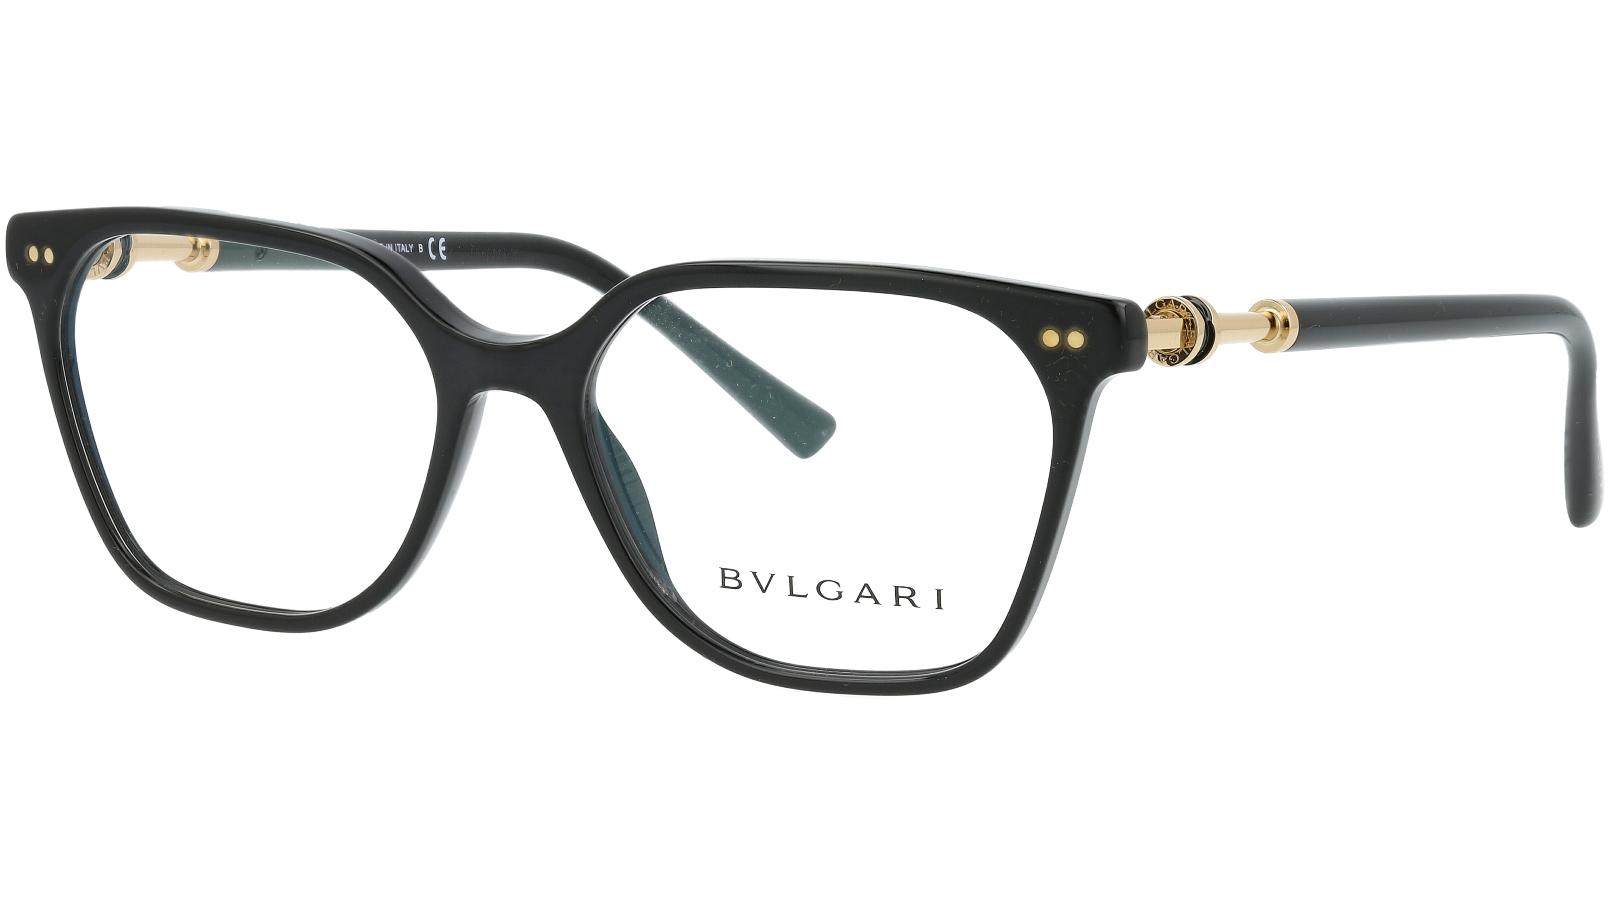 BVLGARI BV4178 501 53 BLACK Glasses